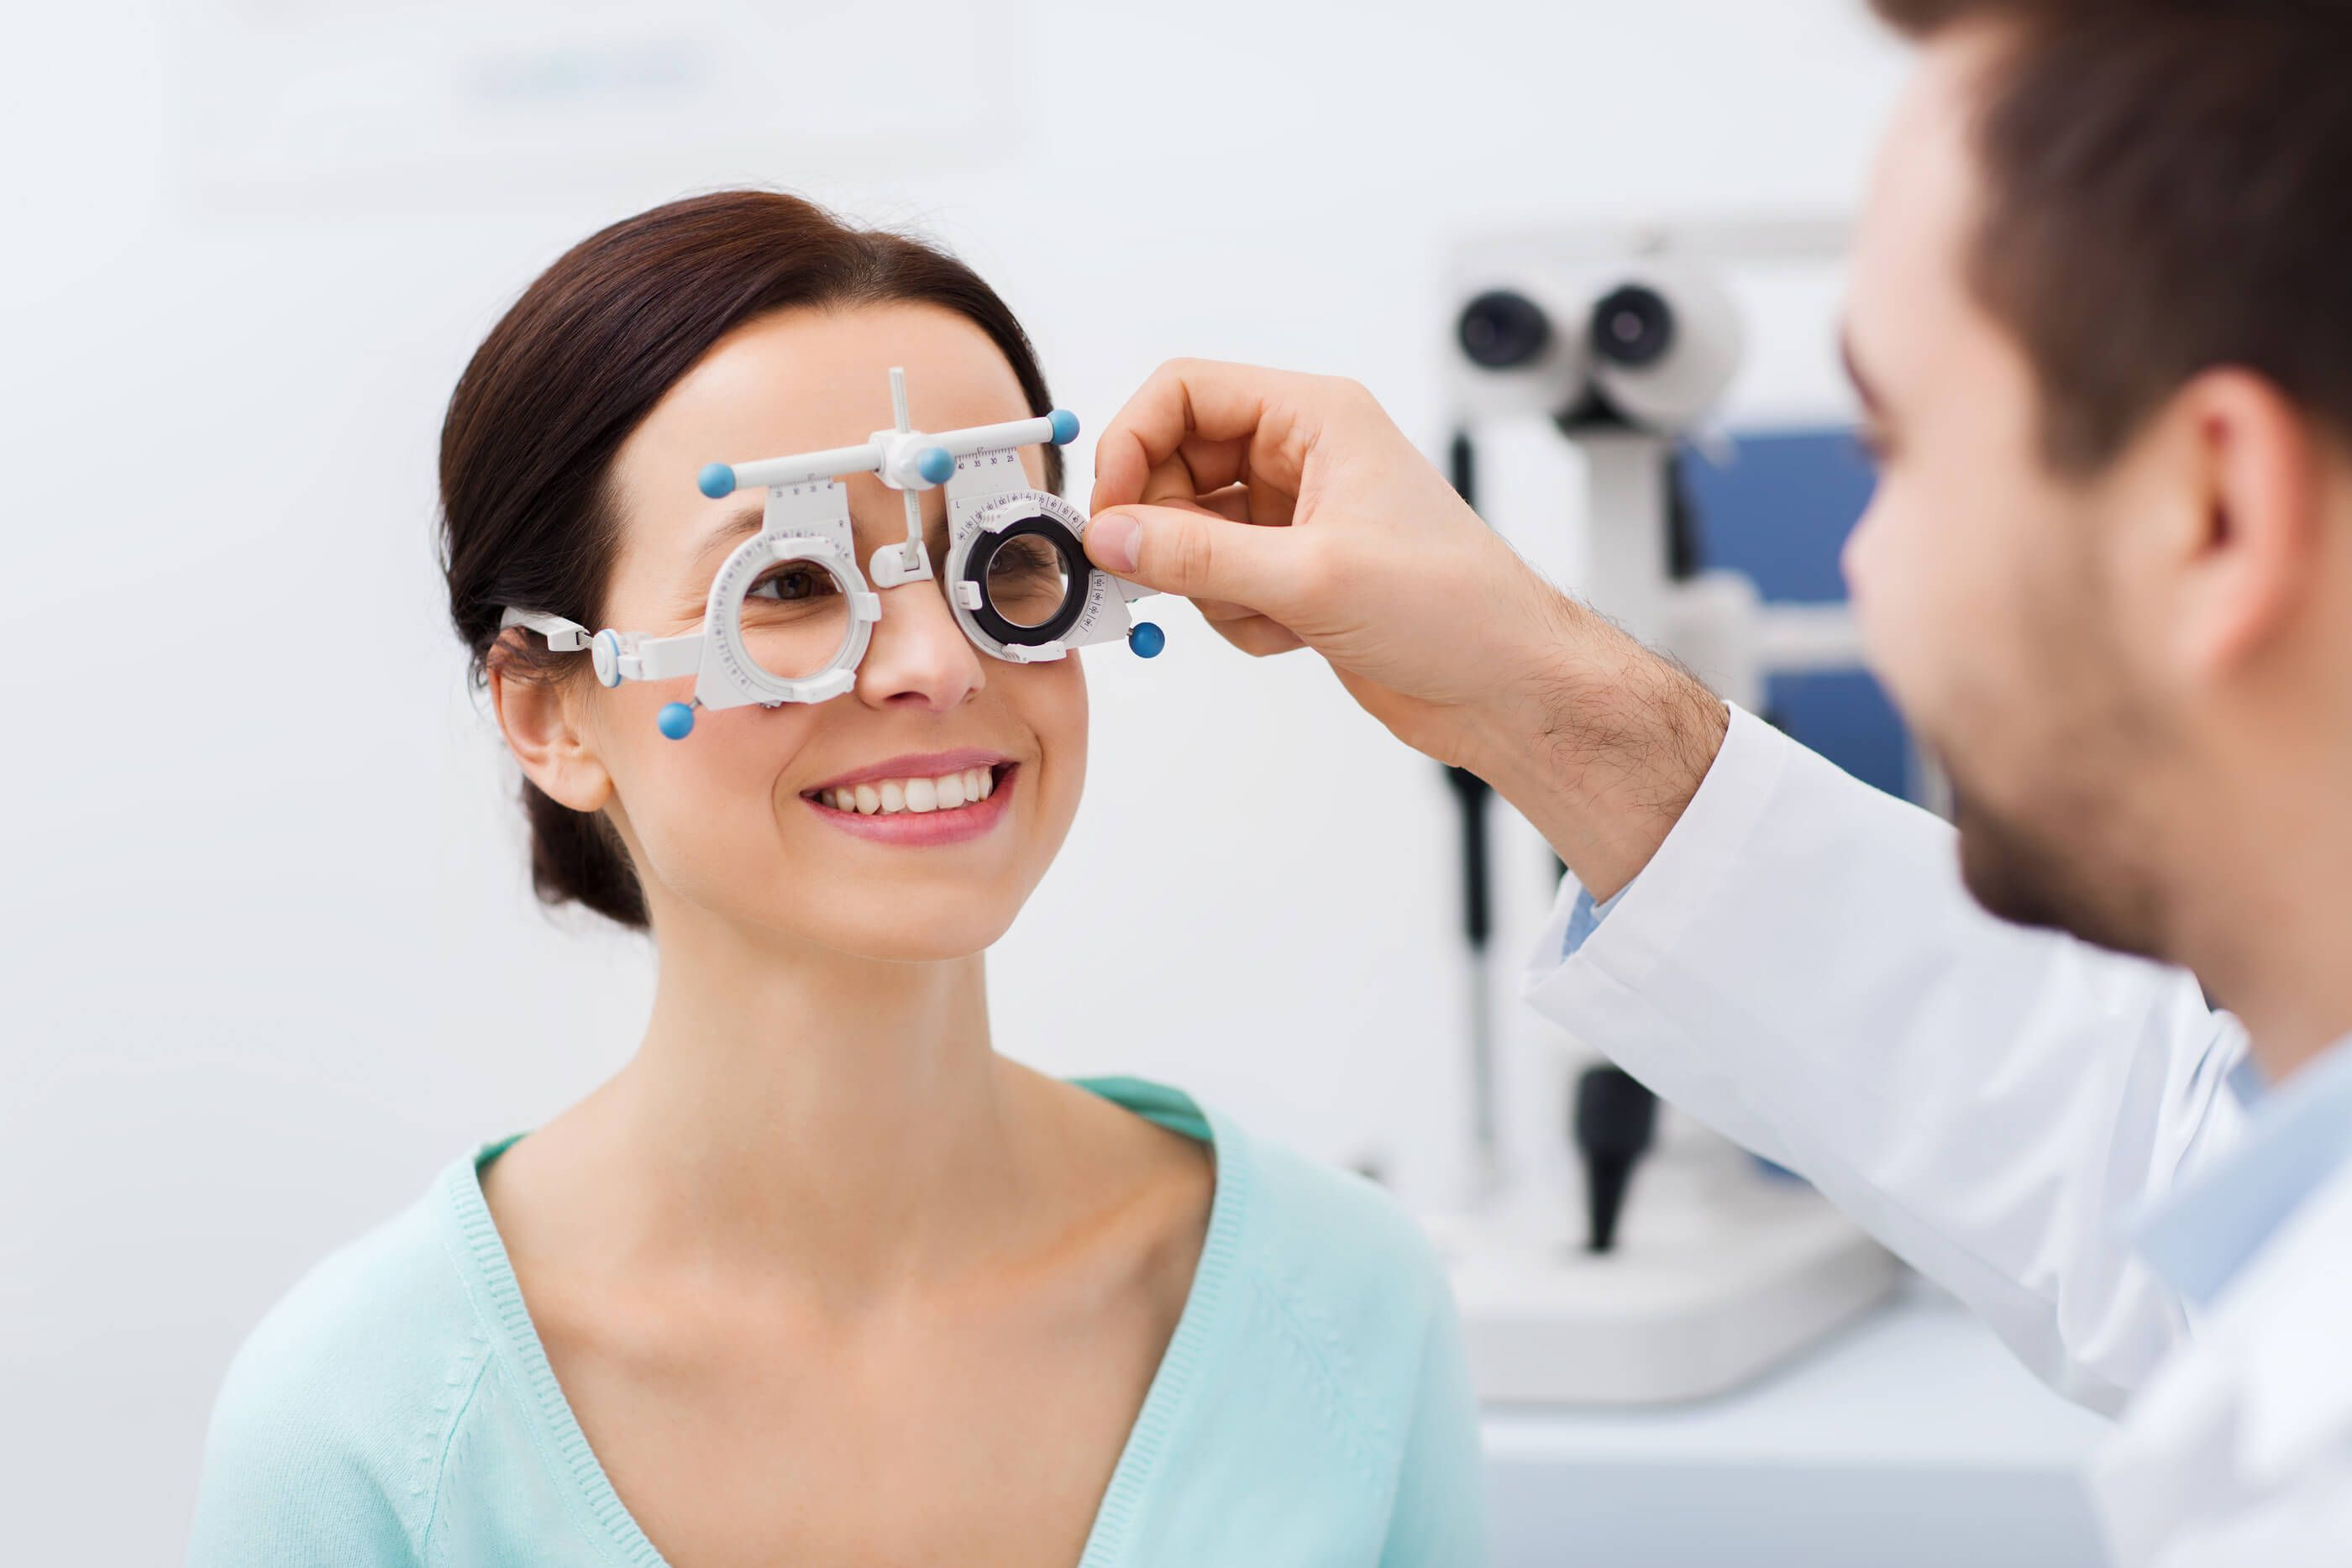 Michigan Dental Plans And Insurance Eye Care Eye Exam Optometrist